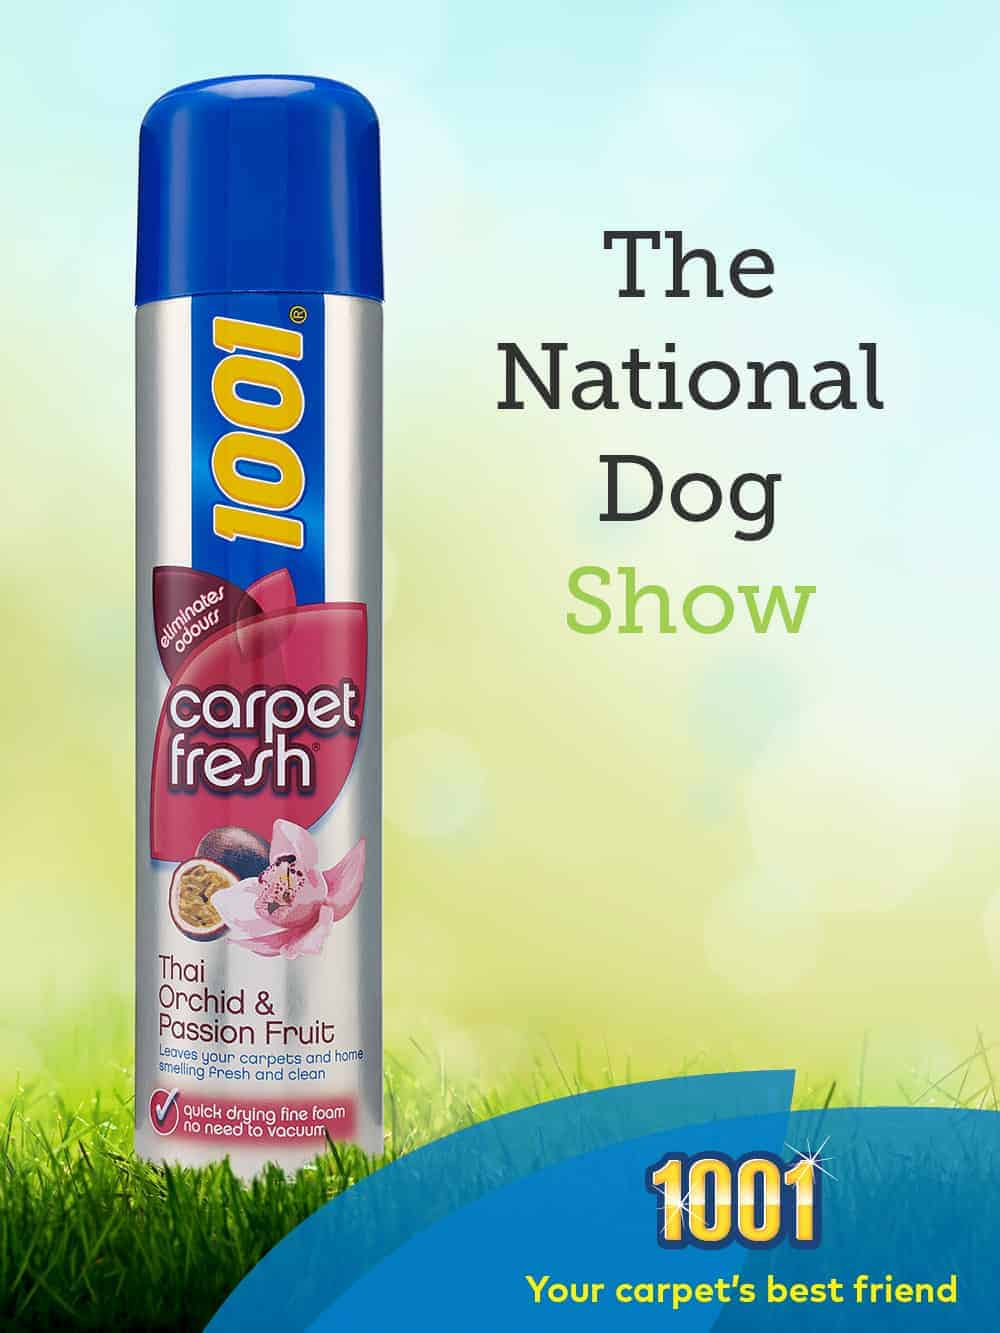 blog may 05 national dog show 011